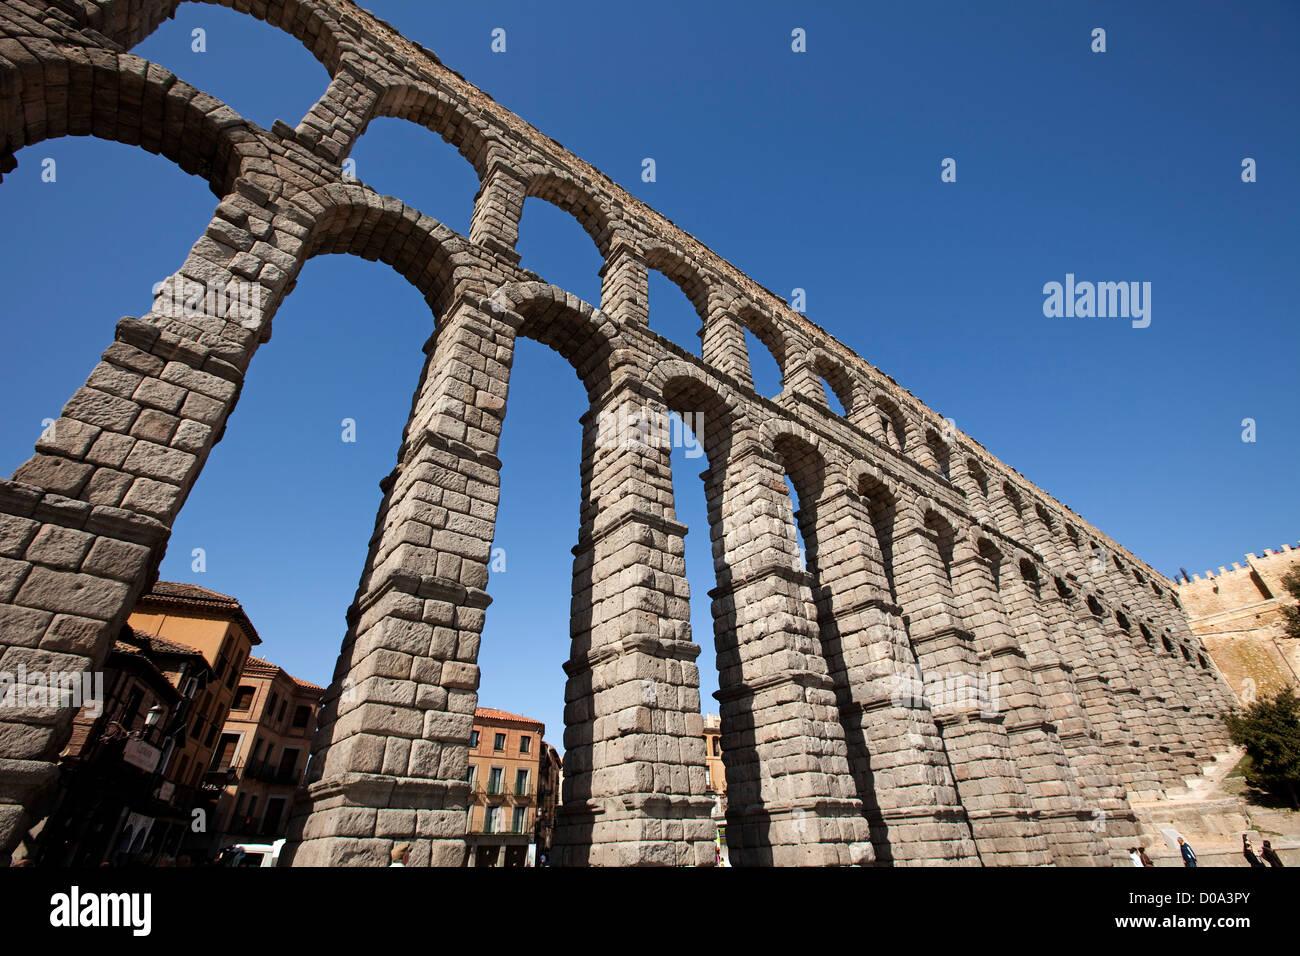 Roman aqueduct of Segovia Castilla Leon Spain Acueducto romano de Segovia Castilla Leon España - Stock Image